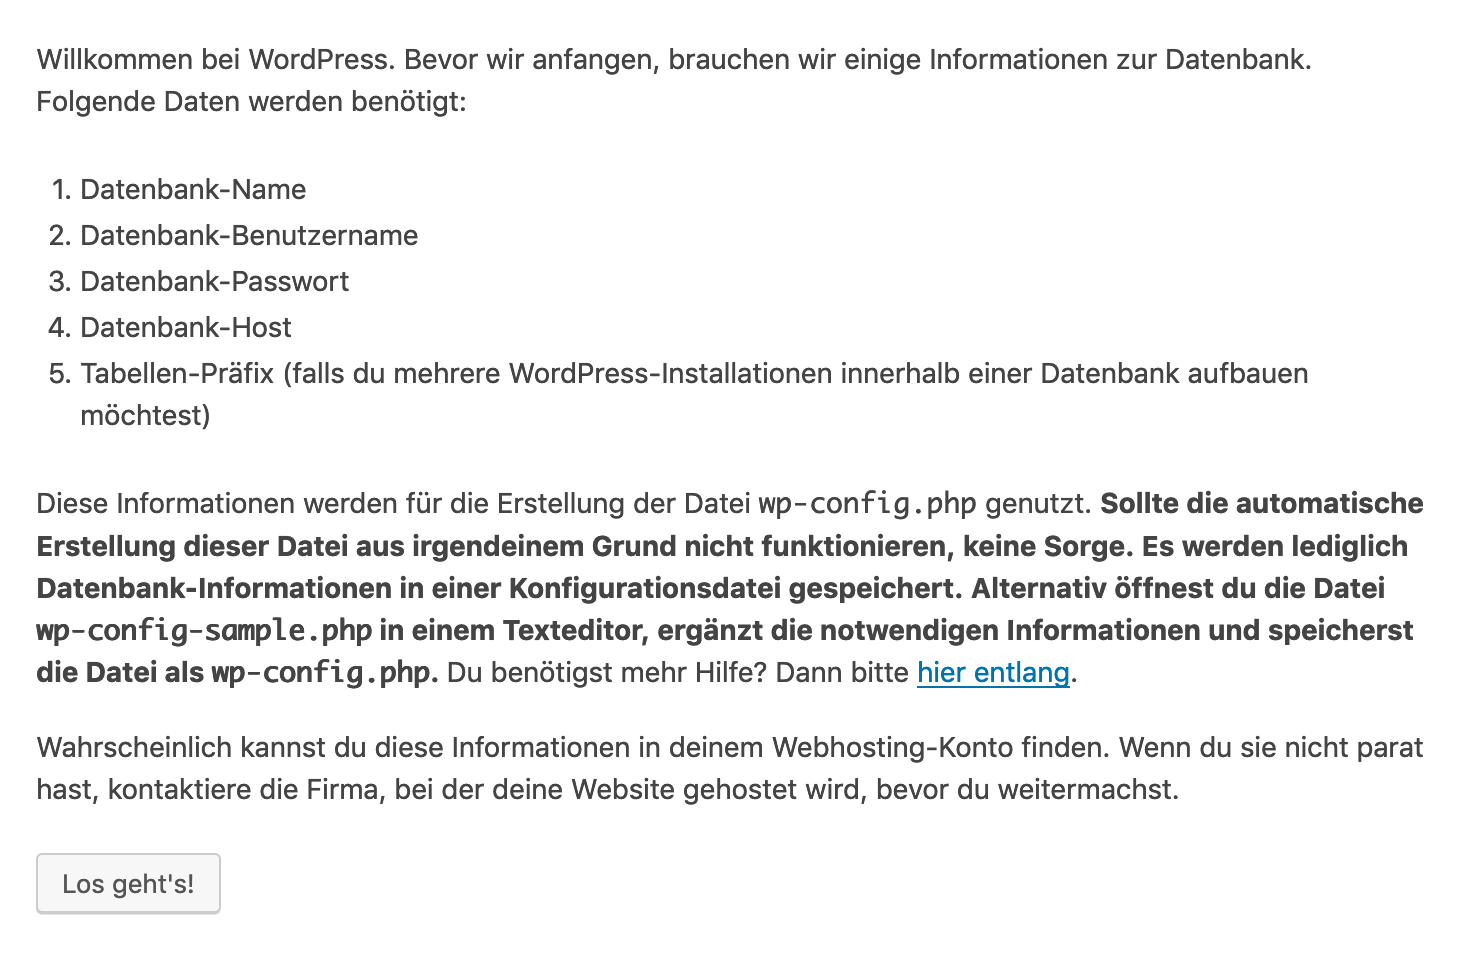 Hinweis zu benötigten Datenbank-Informationen